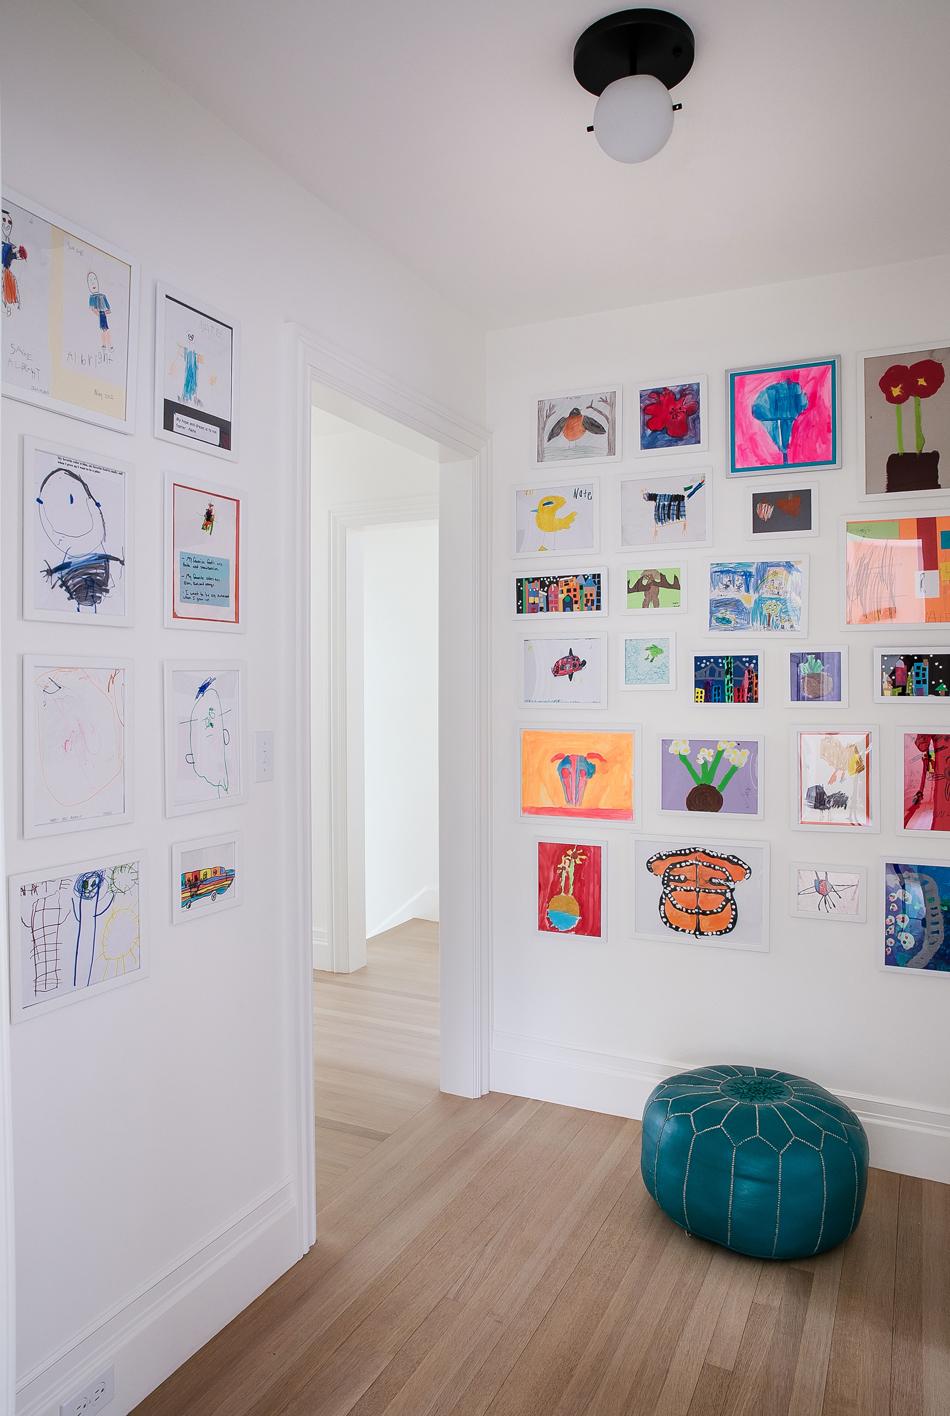 Lawson-Brookline-Katz-kids-gallery_WEB.jpg